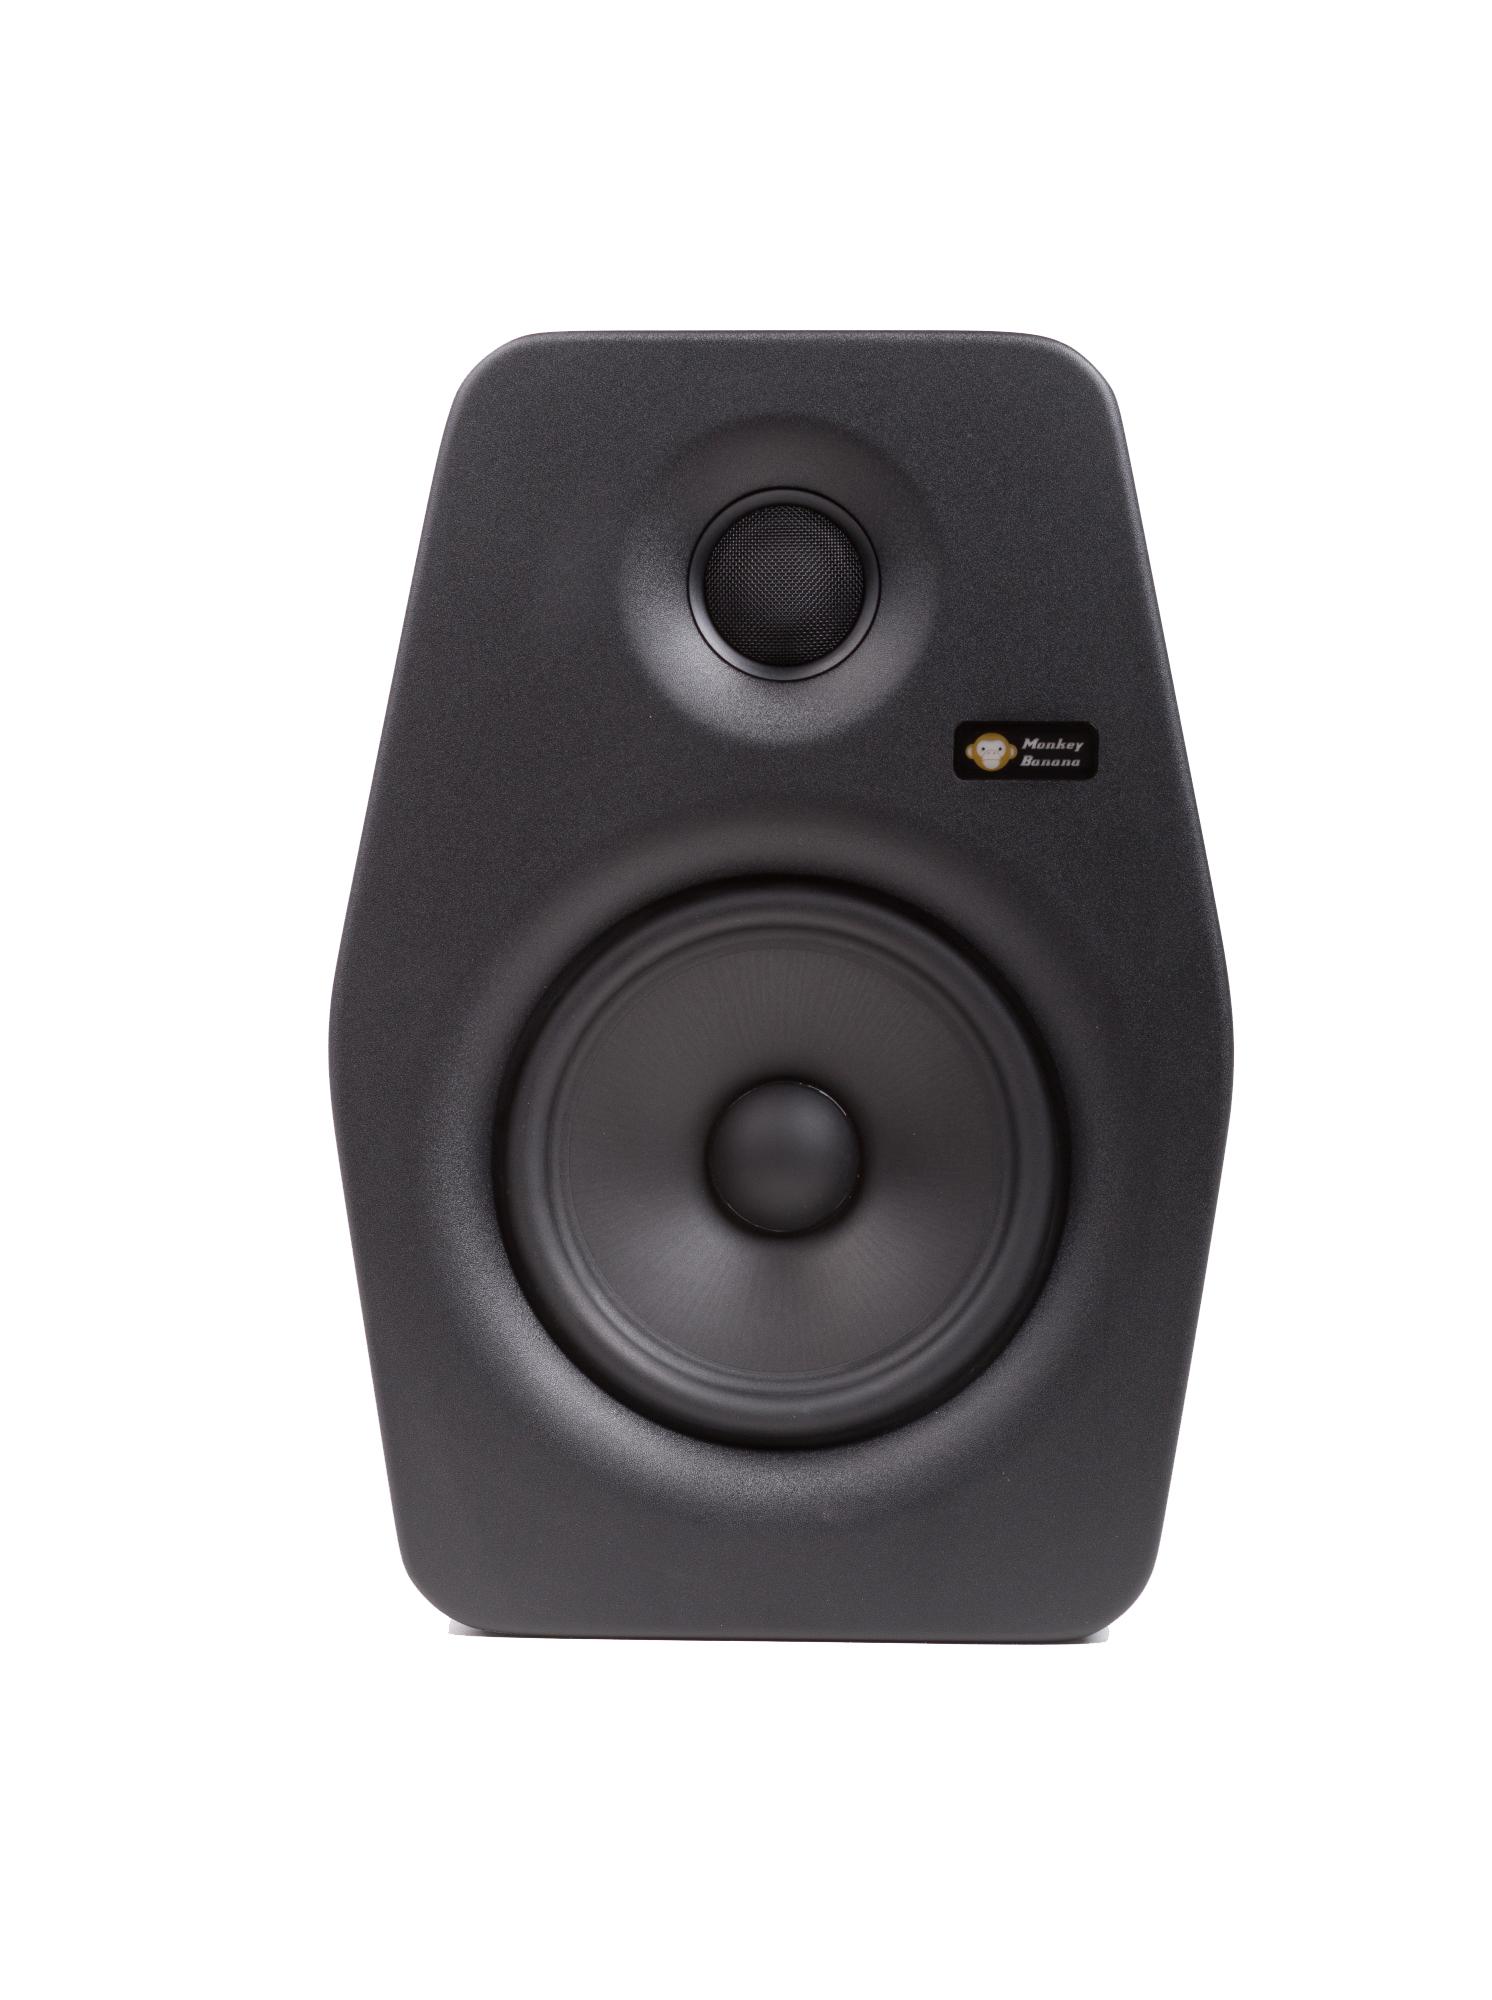 Image of   Monkey Banana Turbo 6 studie højttaler, sort